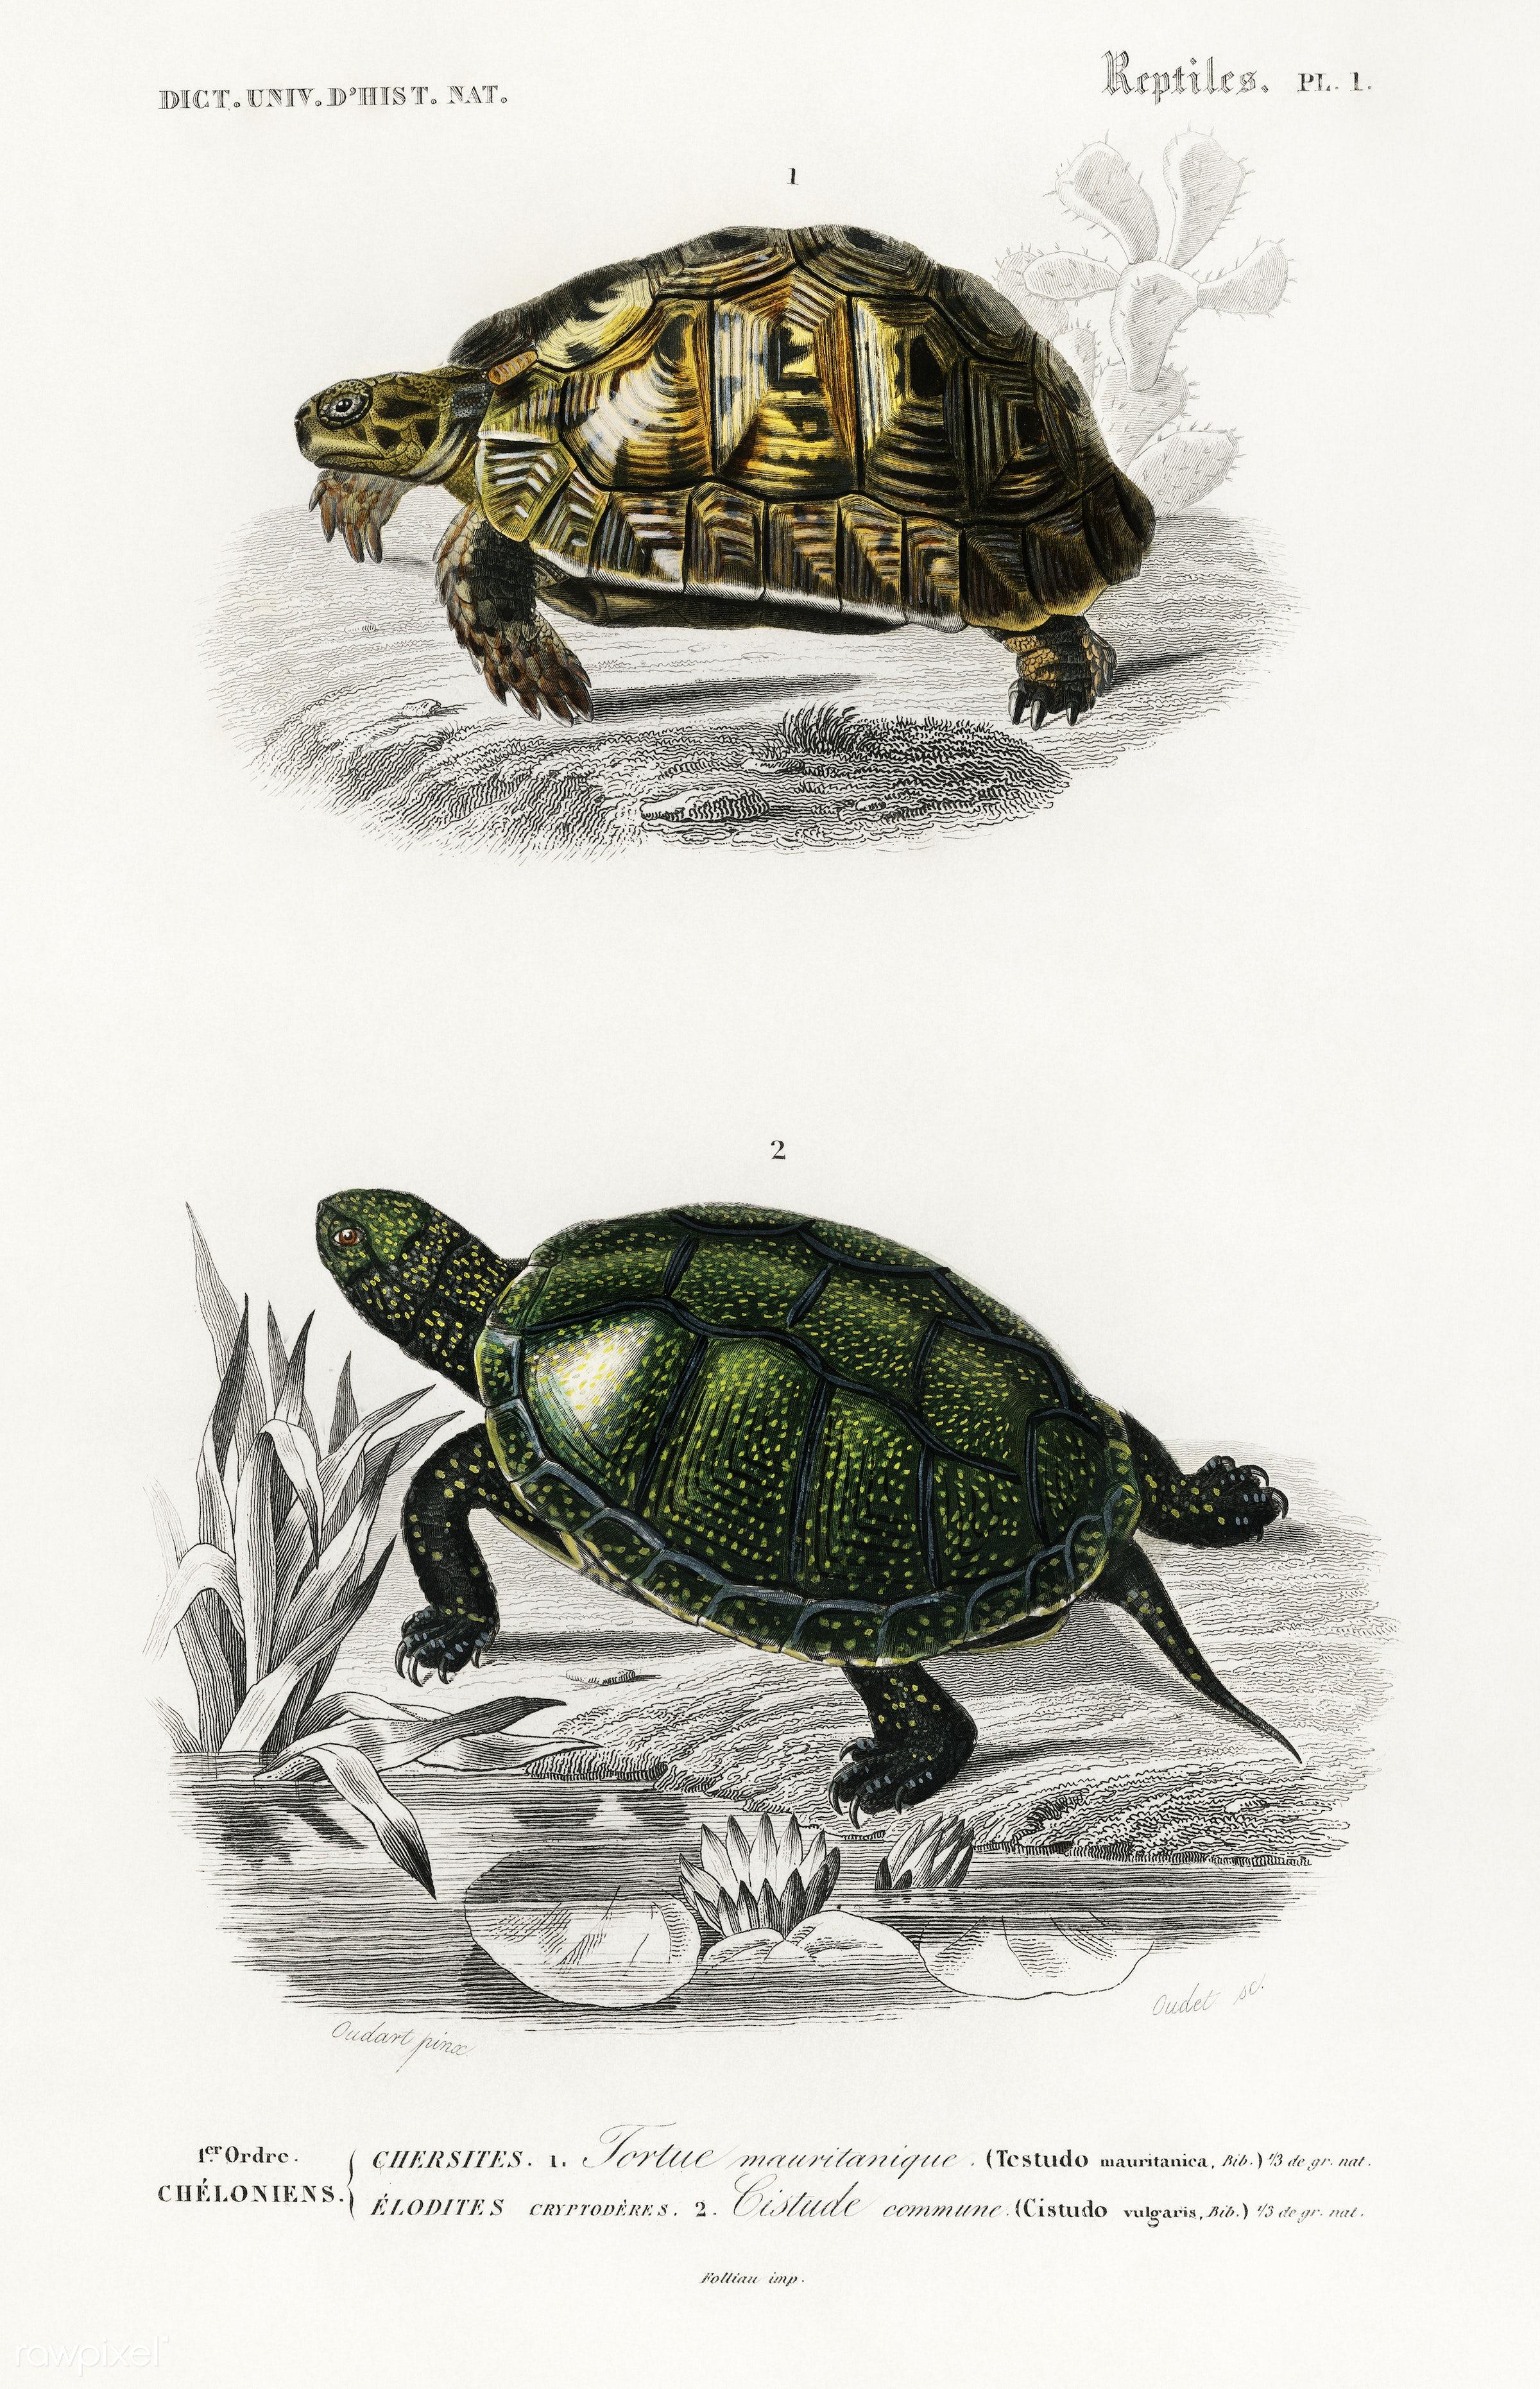 Tortoises (Testudo) and Pond turtle (Emys orbicularis) illustrated by Charles Dessalines D' Orbigny (1806-1876)....